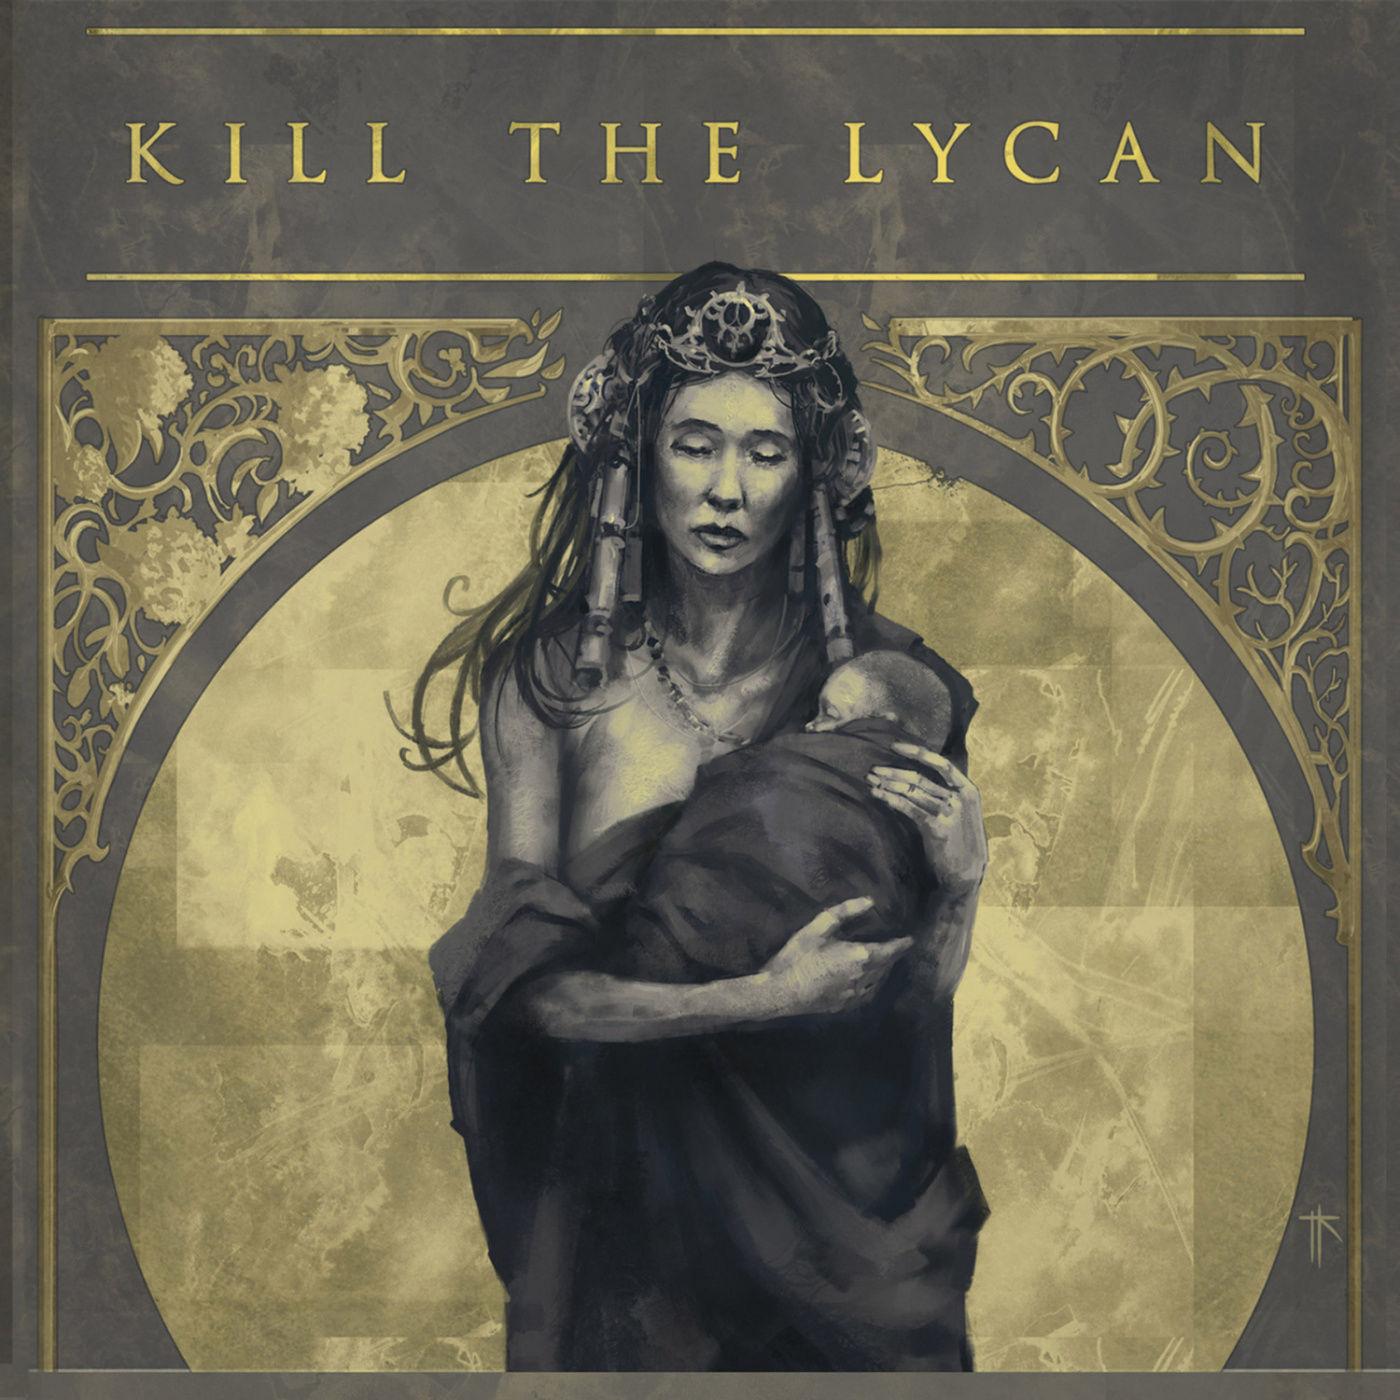 Kill The Lycan - Rhea (2019)